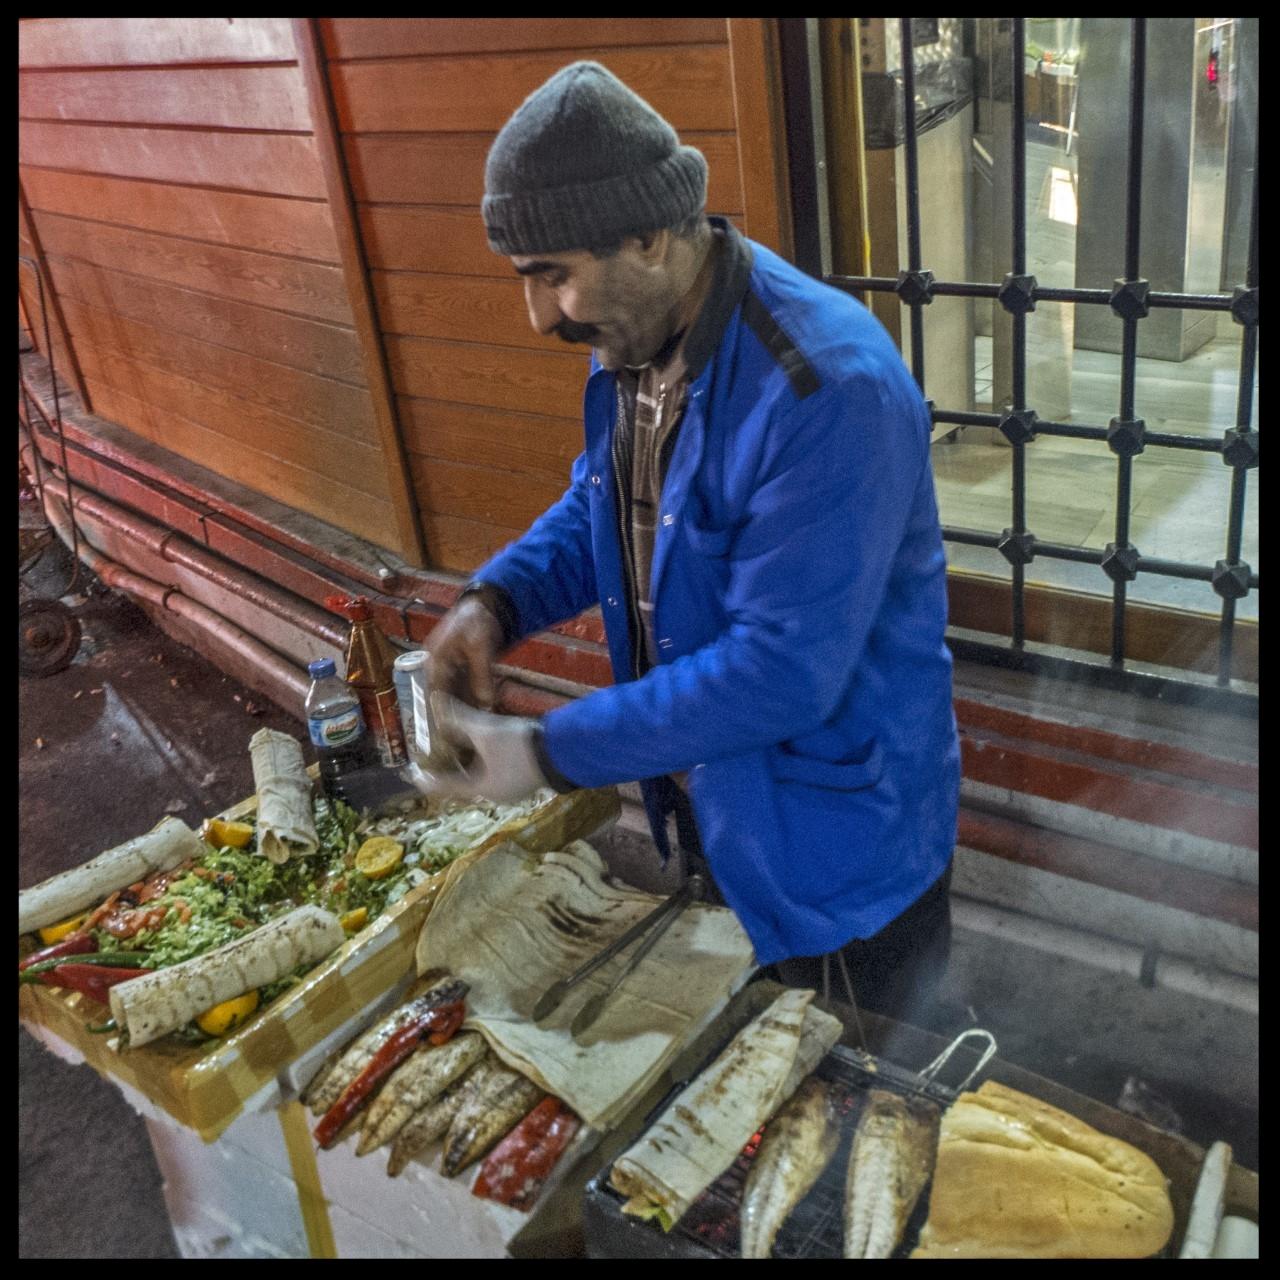 Master sandwich maker (photo by J. Yuenger)